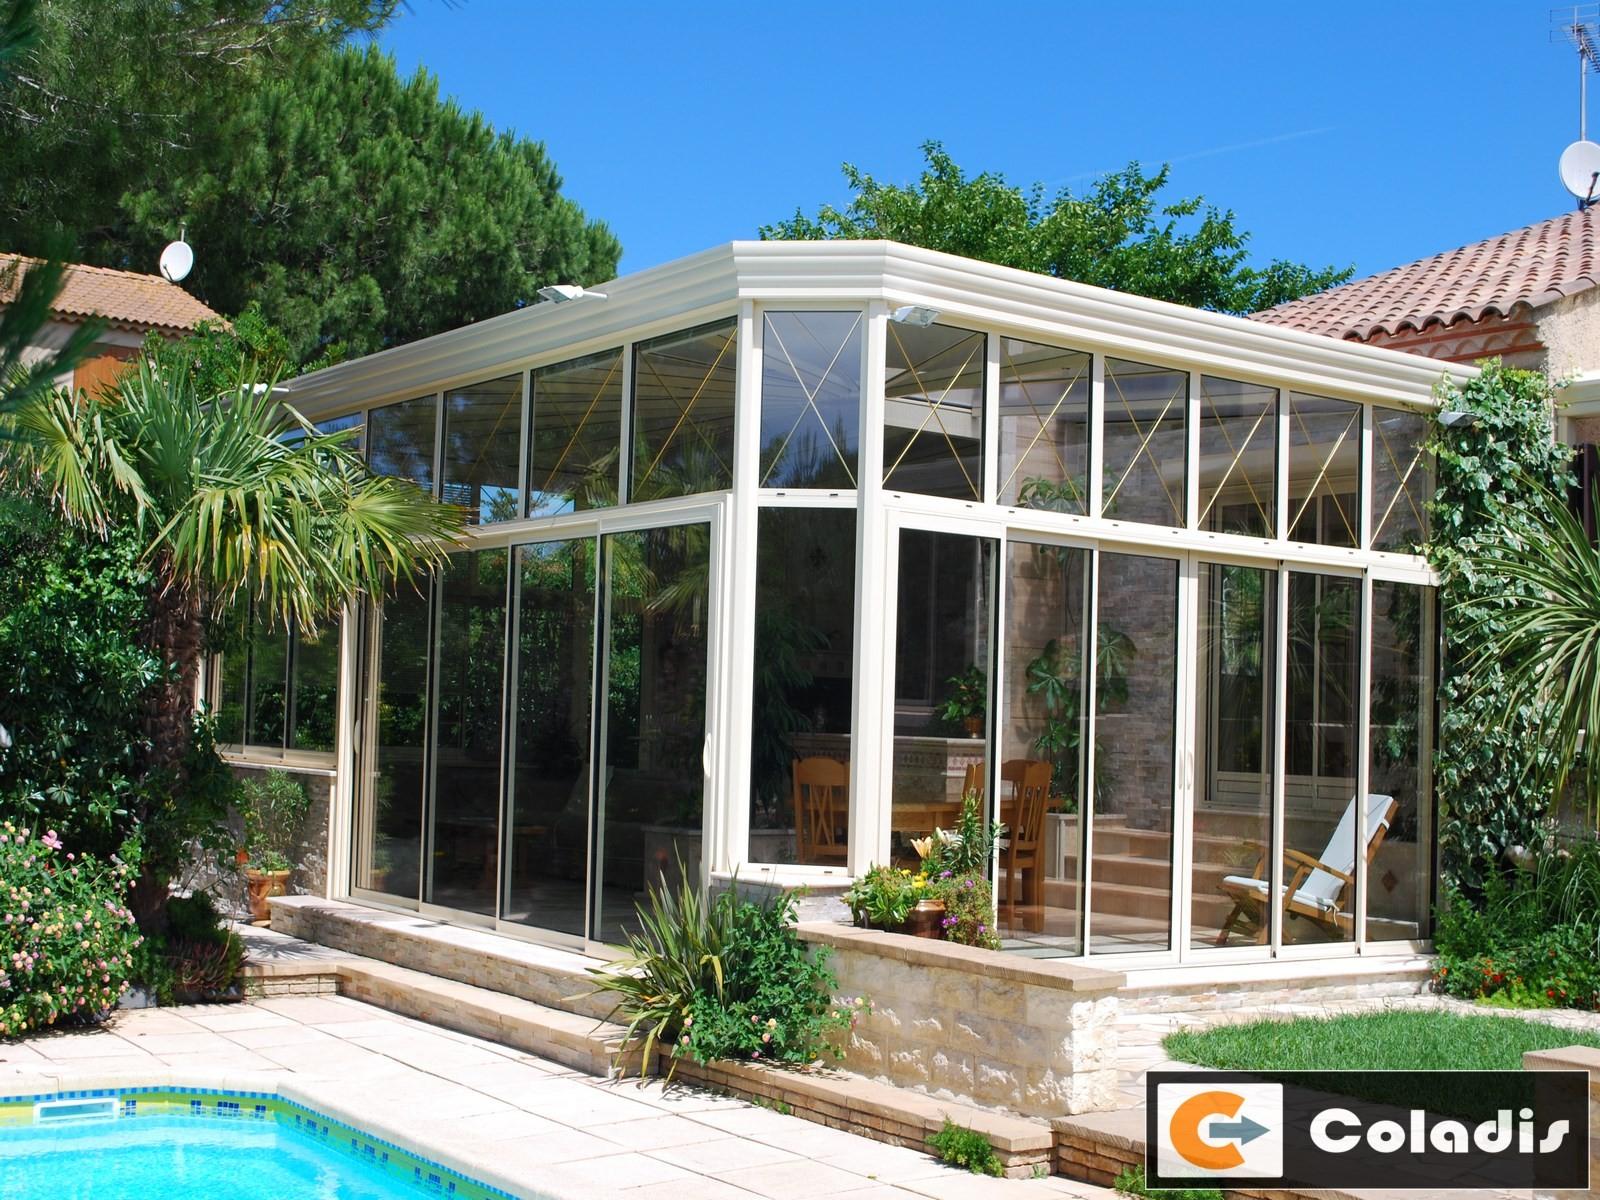 Veranda Occasion Bretagne - Veranda Et Abri Jardin dedans Ancienne Serre De Jardin Occasion Le Bon Coin